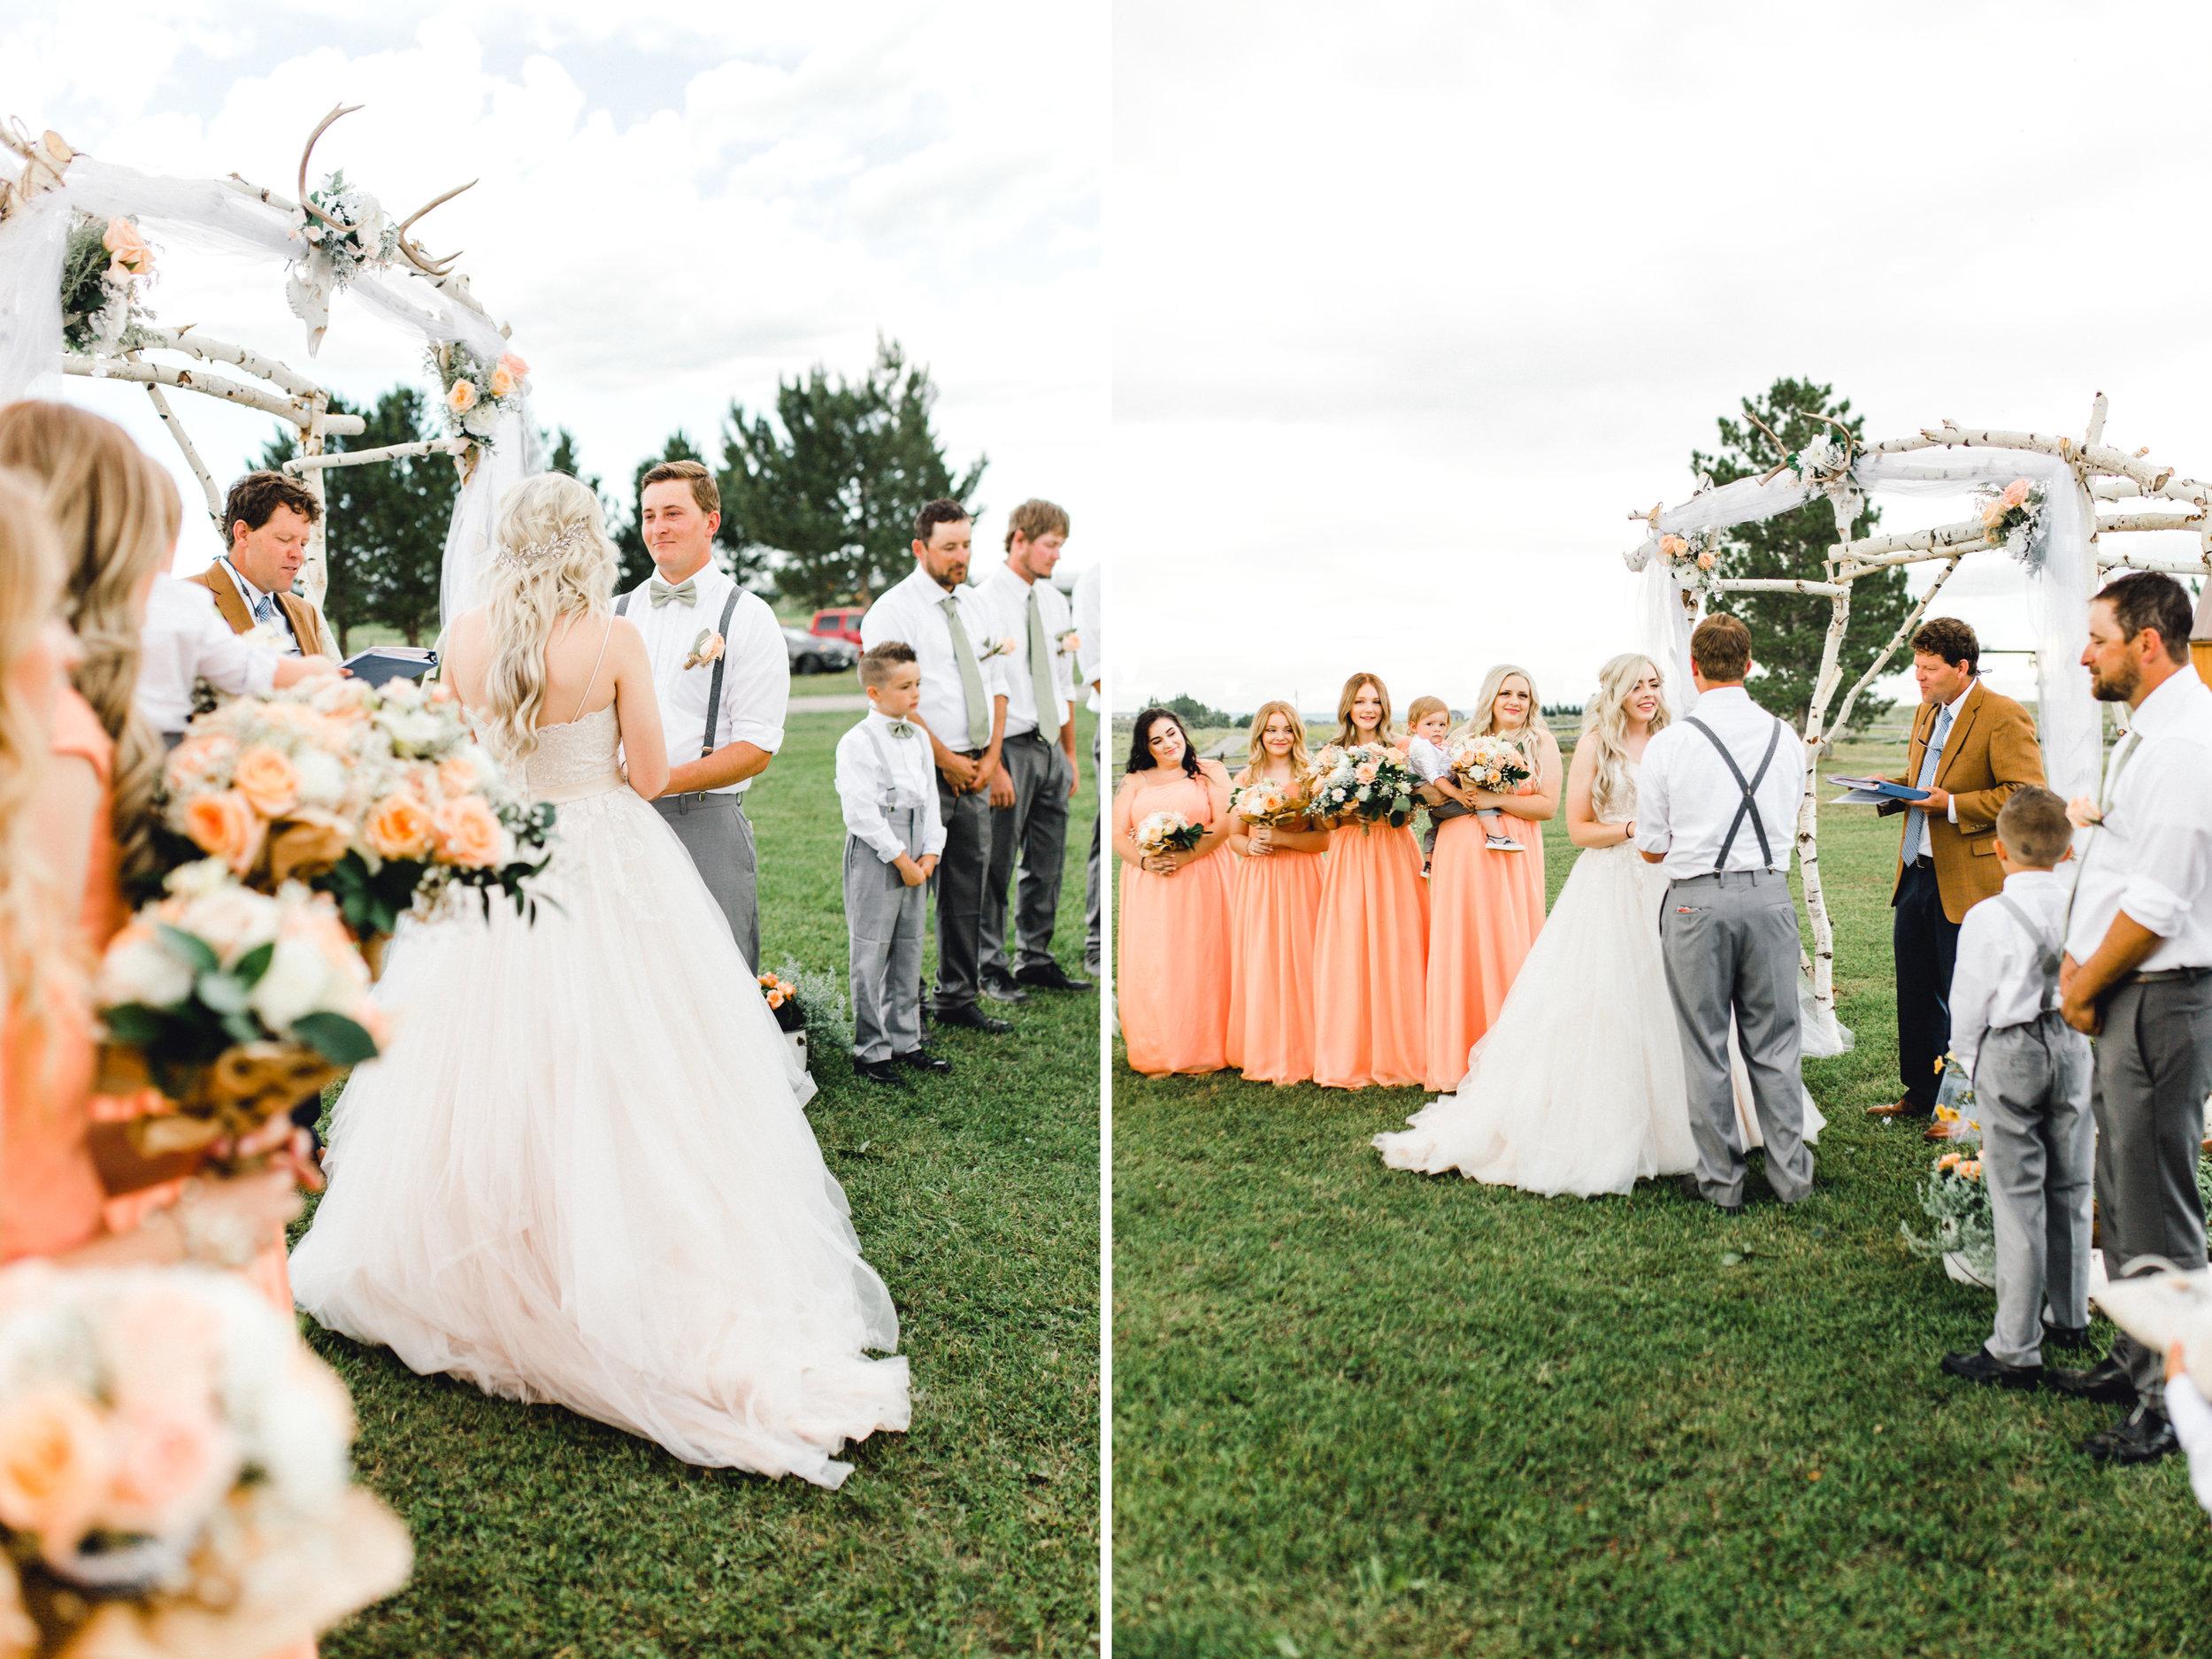 country-outdoor-rustic-wedding-tetons-idaho-anna-christine-photo-19.jpg